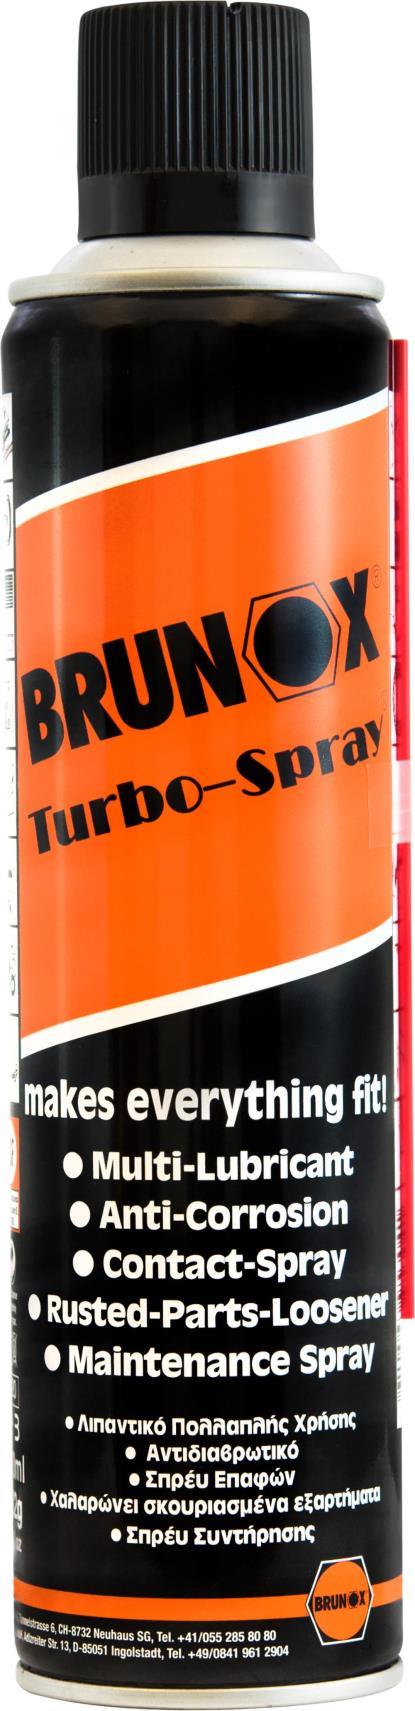 Picture of Brunox Turbo Spray(Multi-Function Spray) (400ml)